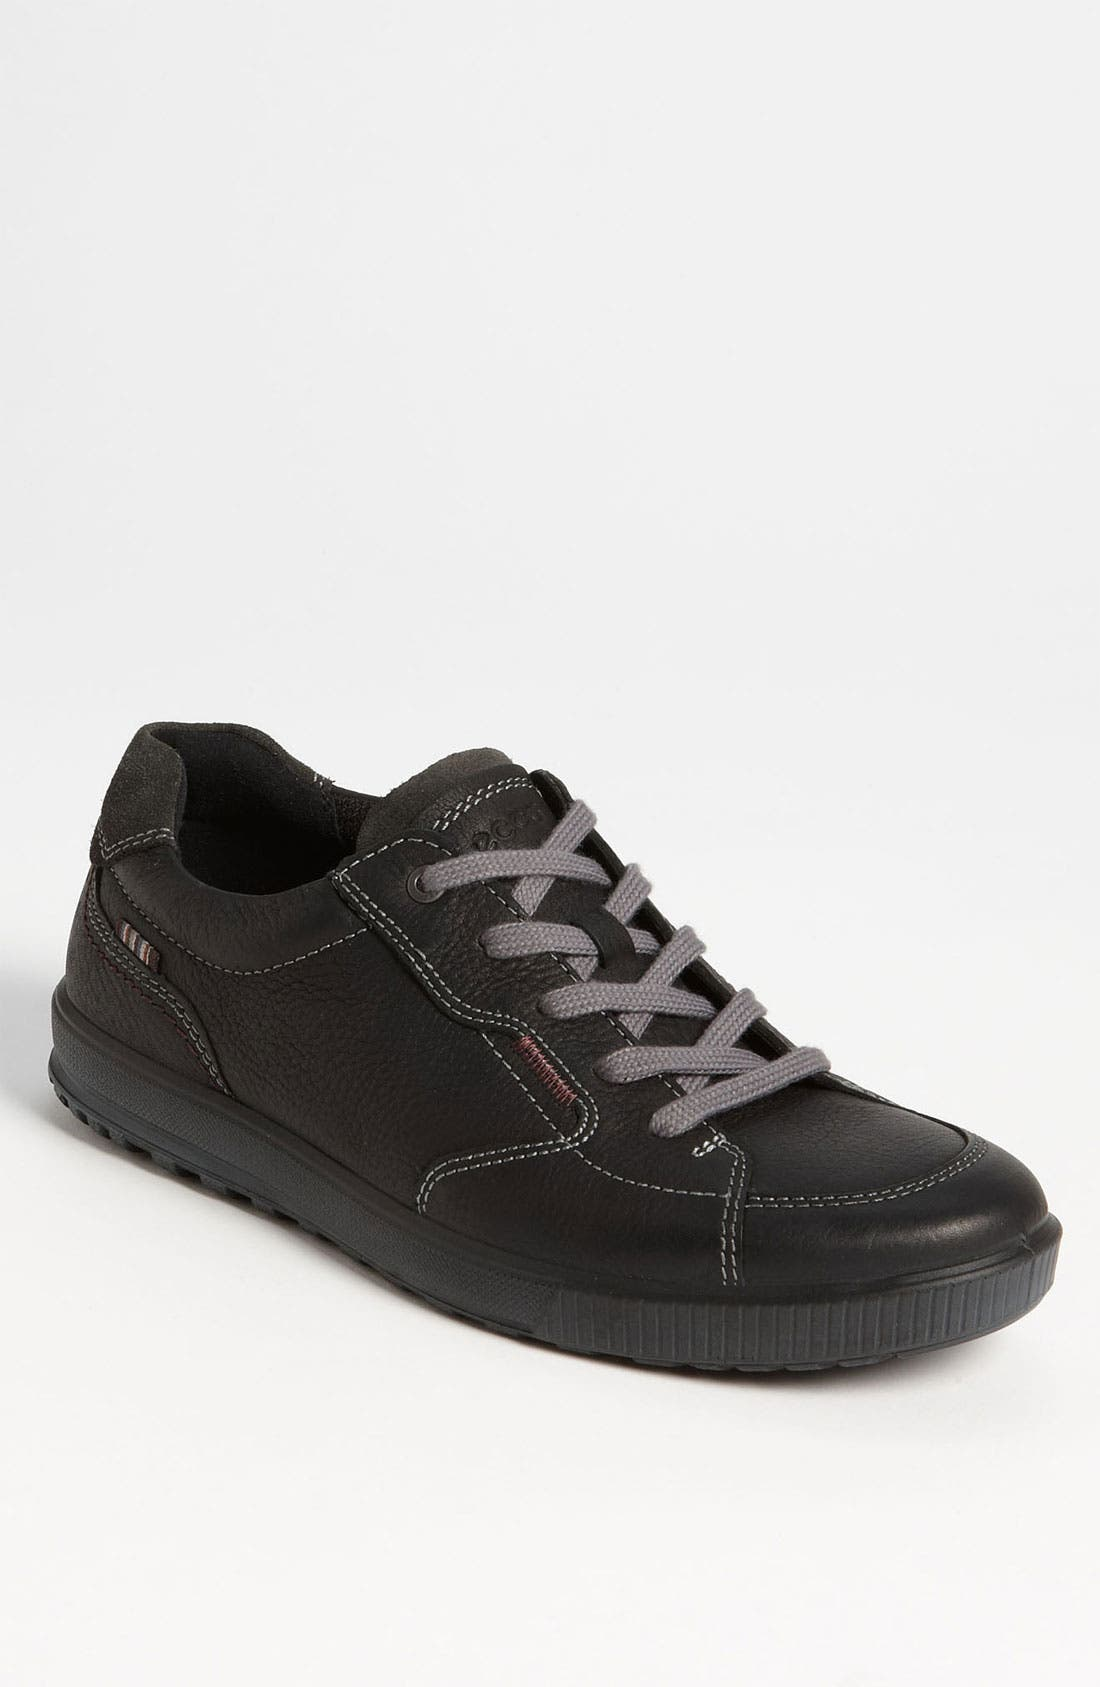 Main Image - ECCO 'Bradley' Sneaker